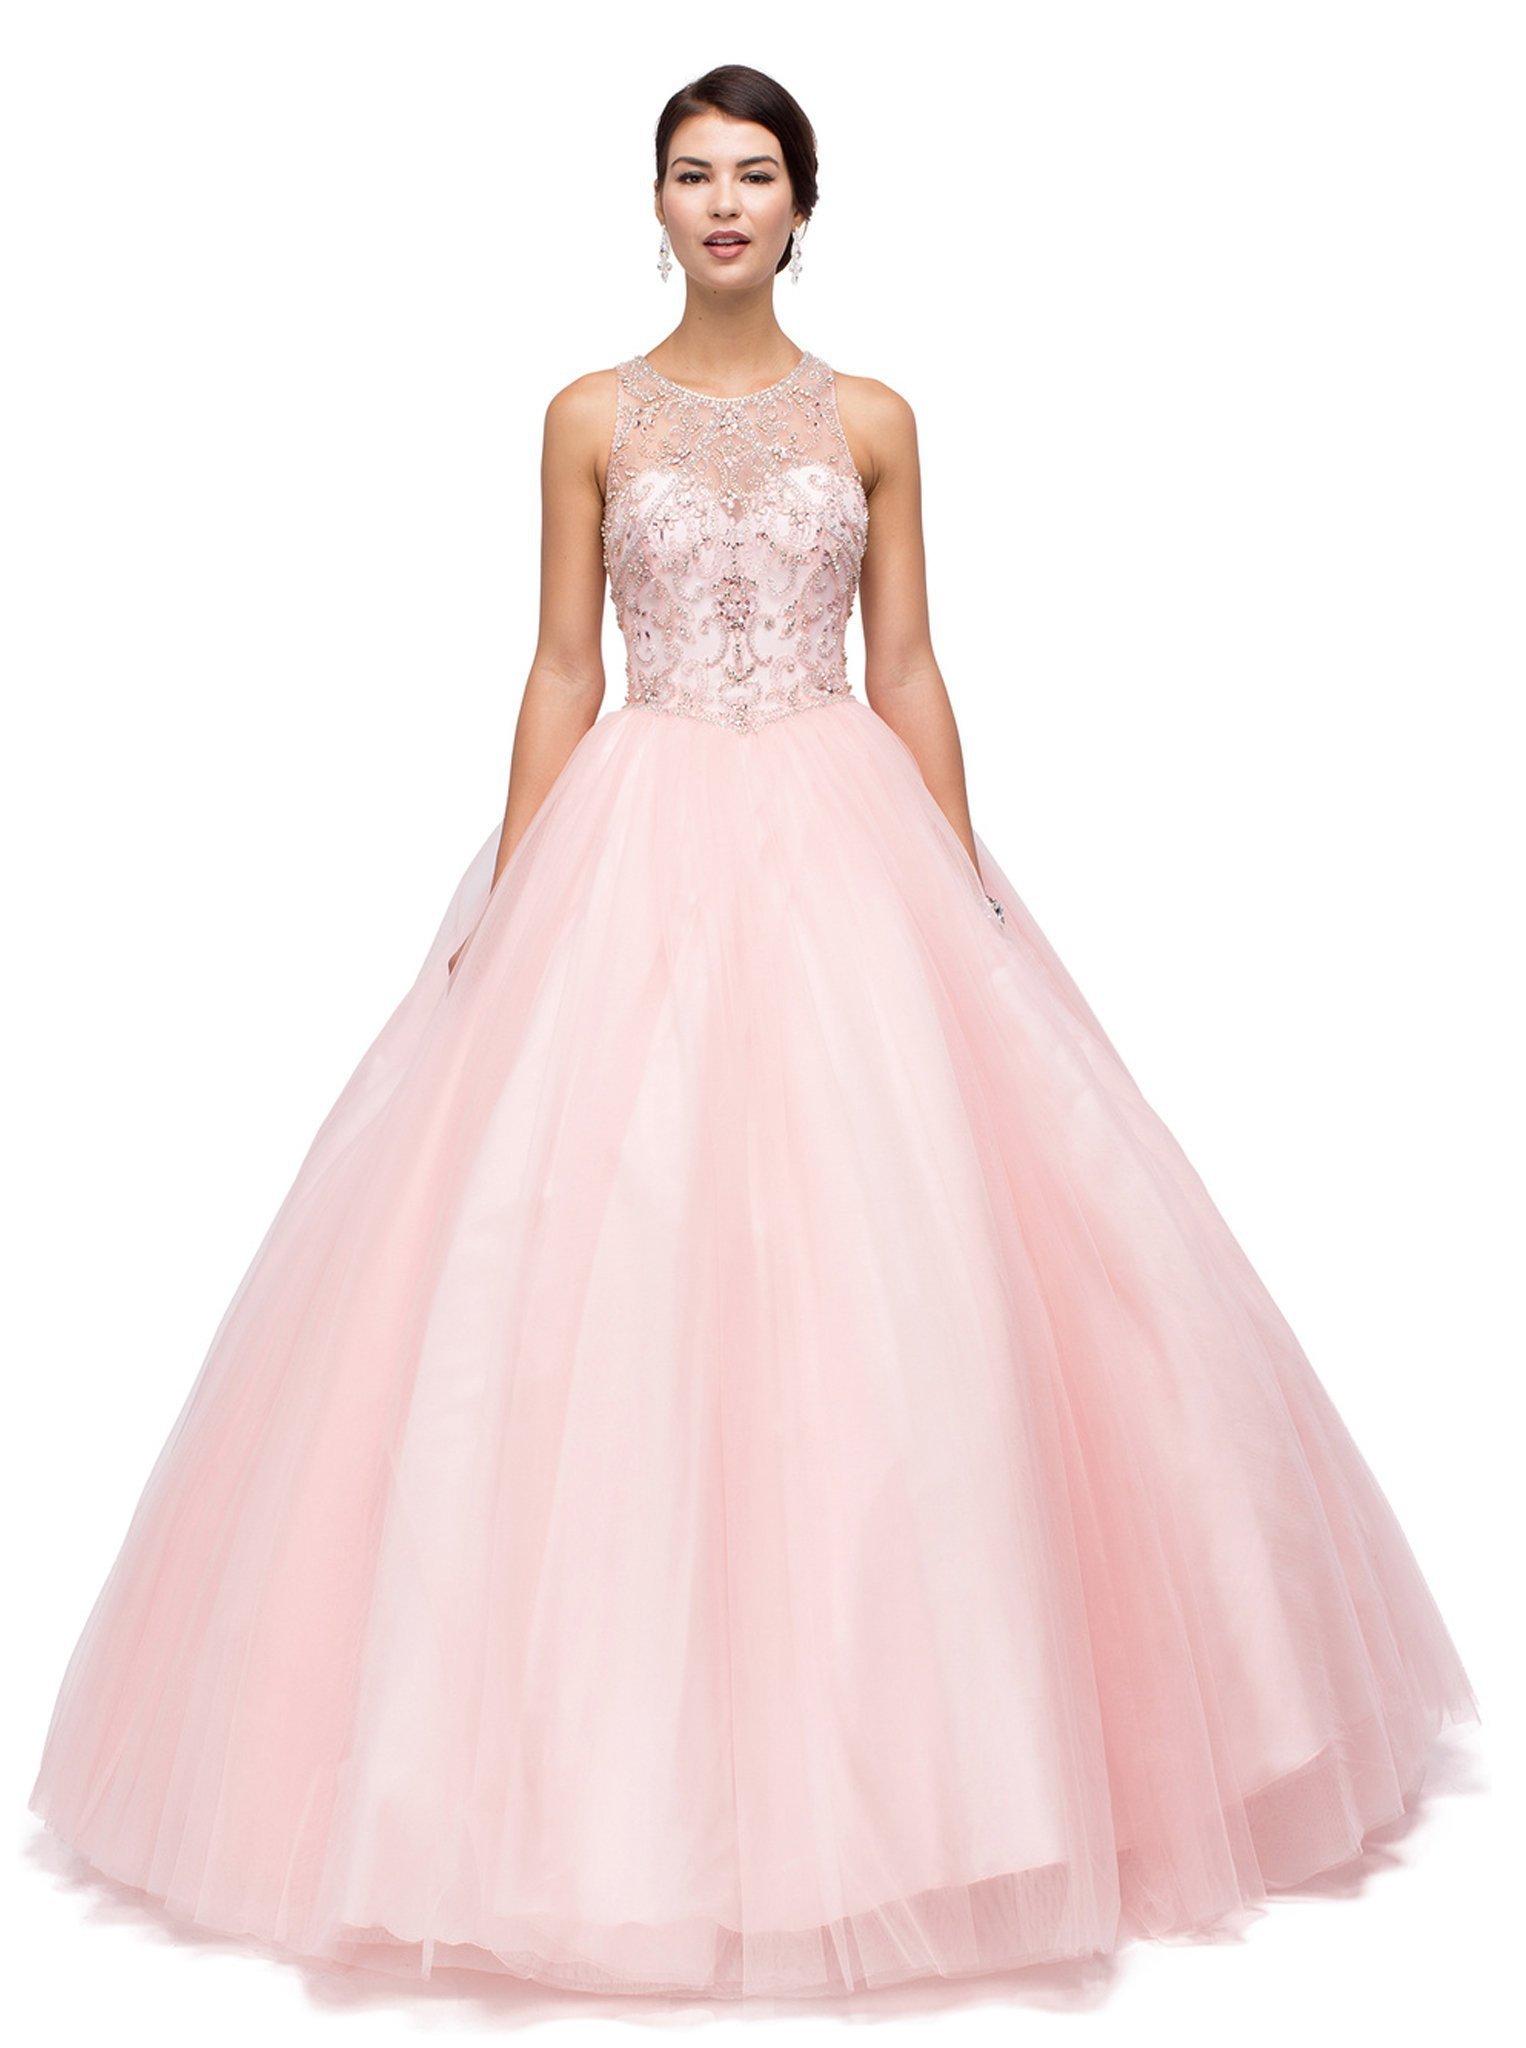 Dancing Queen - 1160 Embellished Illusion Jewel Neckline Quinceanera Ball Gown